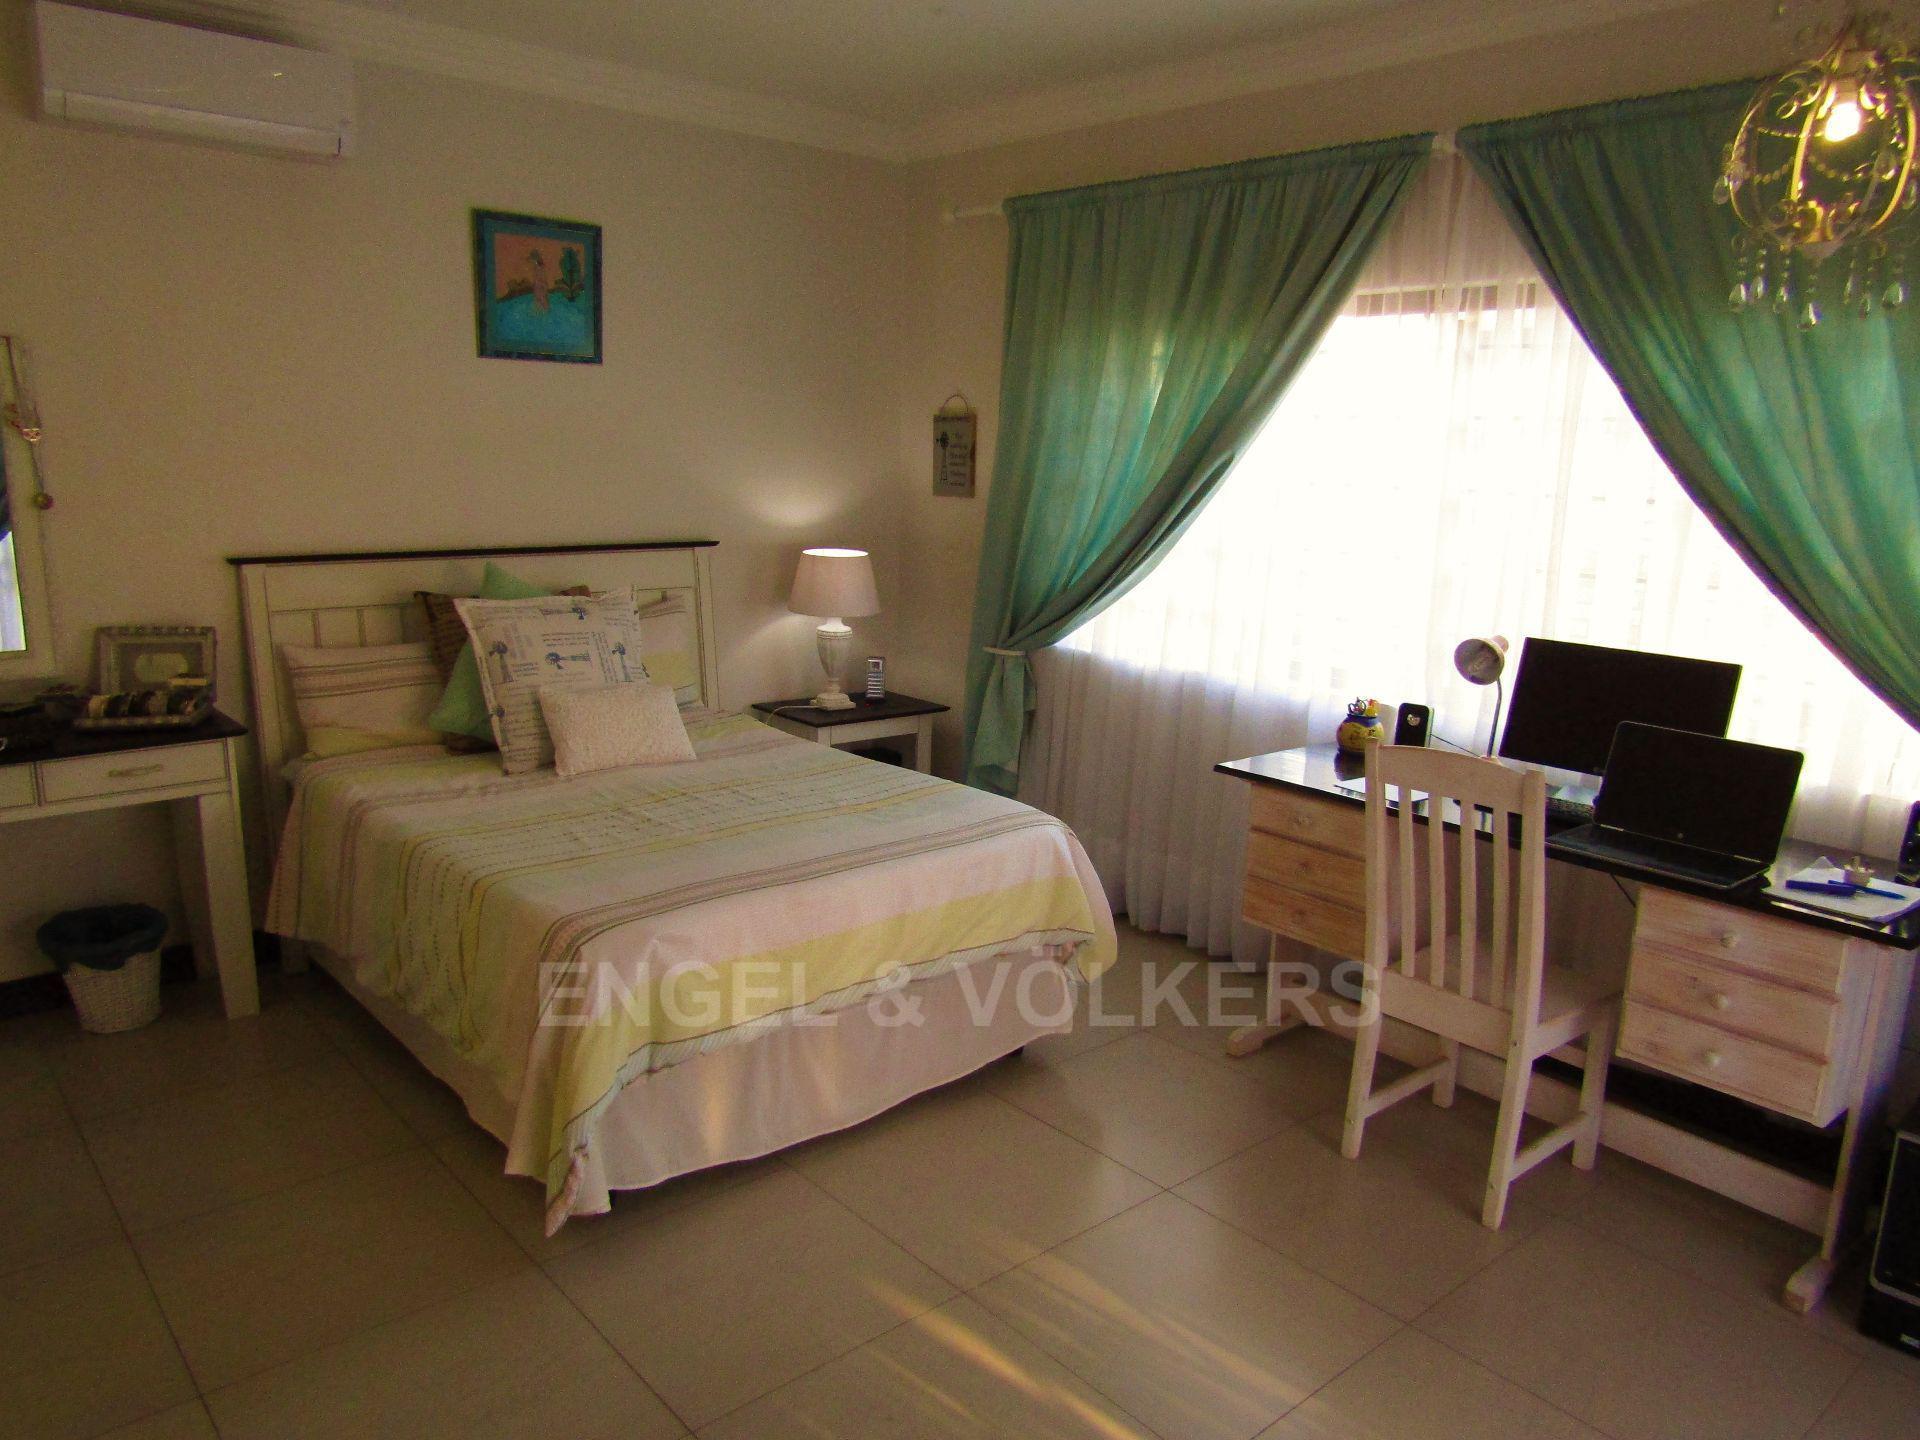 Lifestyle Estate property for sale. Ref No: 13458759. Picture no 19